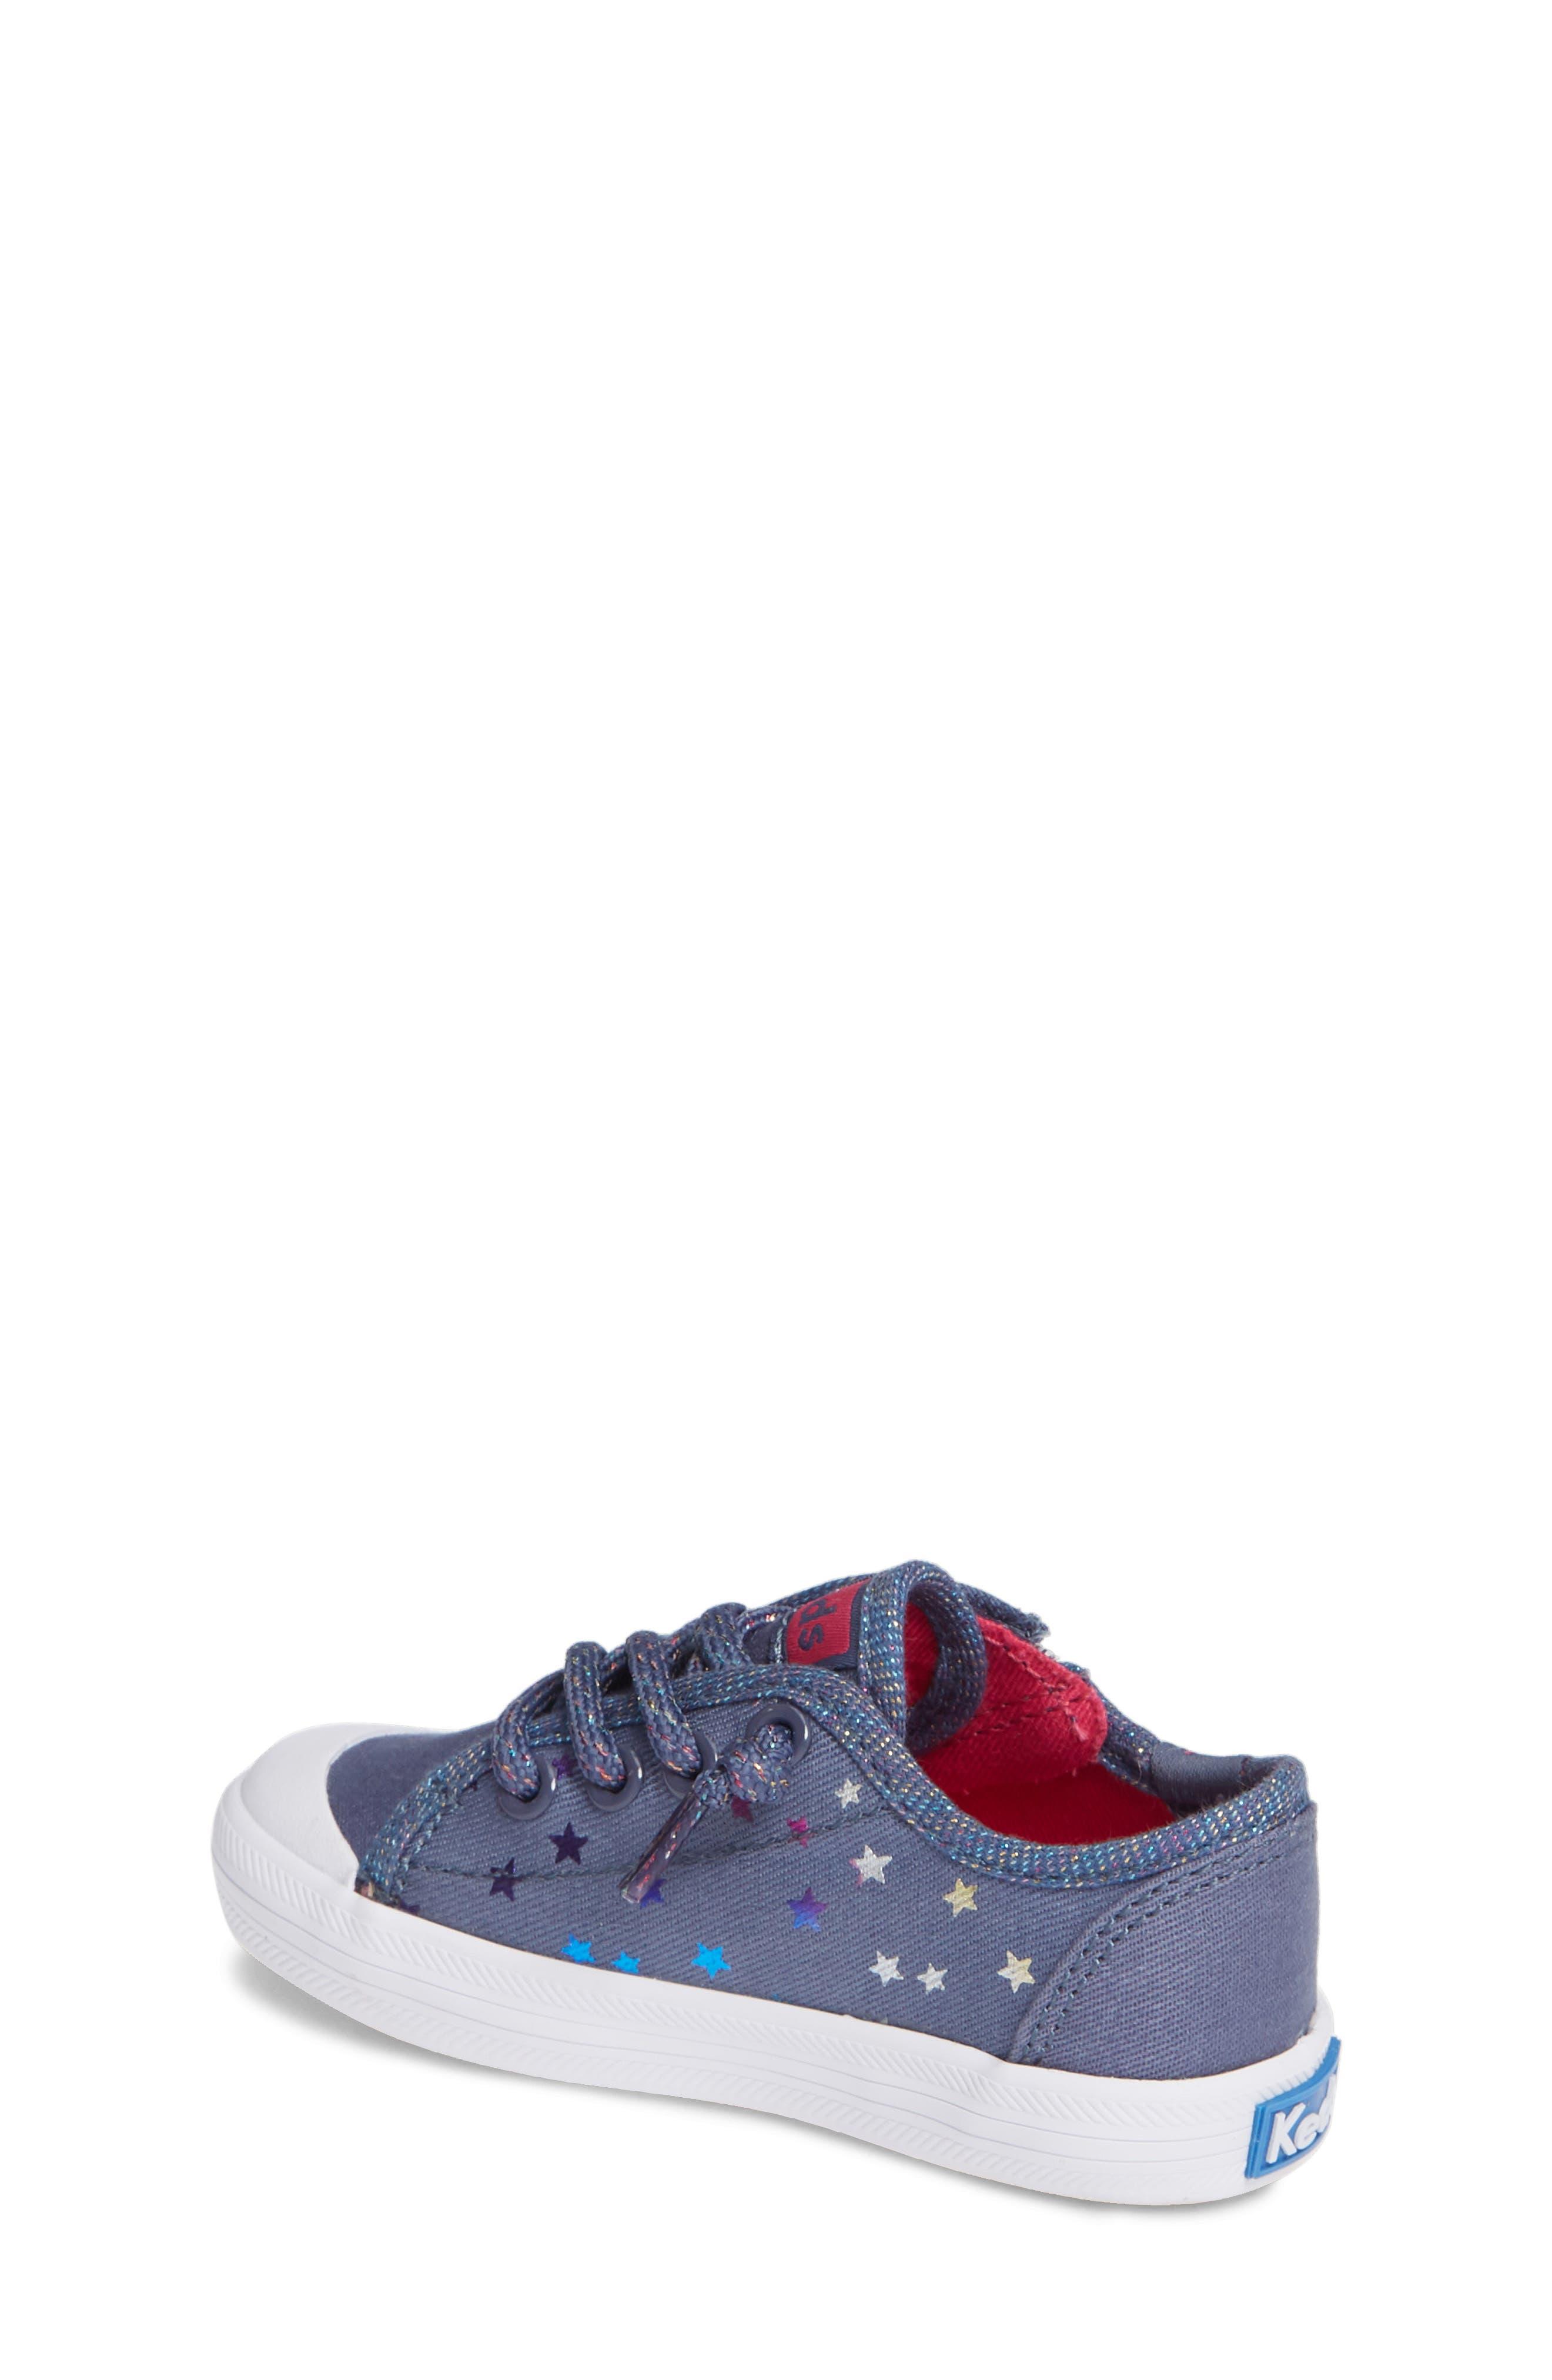 KEDS<SUP>®</SUP>, Kickstart Cap Toe Sneaker, Alternate thumbnail 2, color, STAR PERF